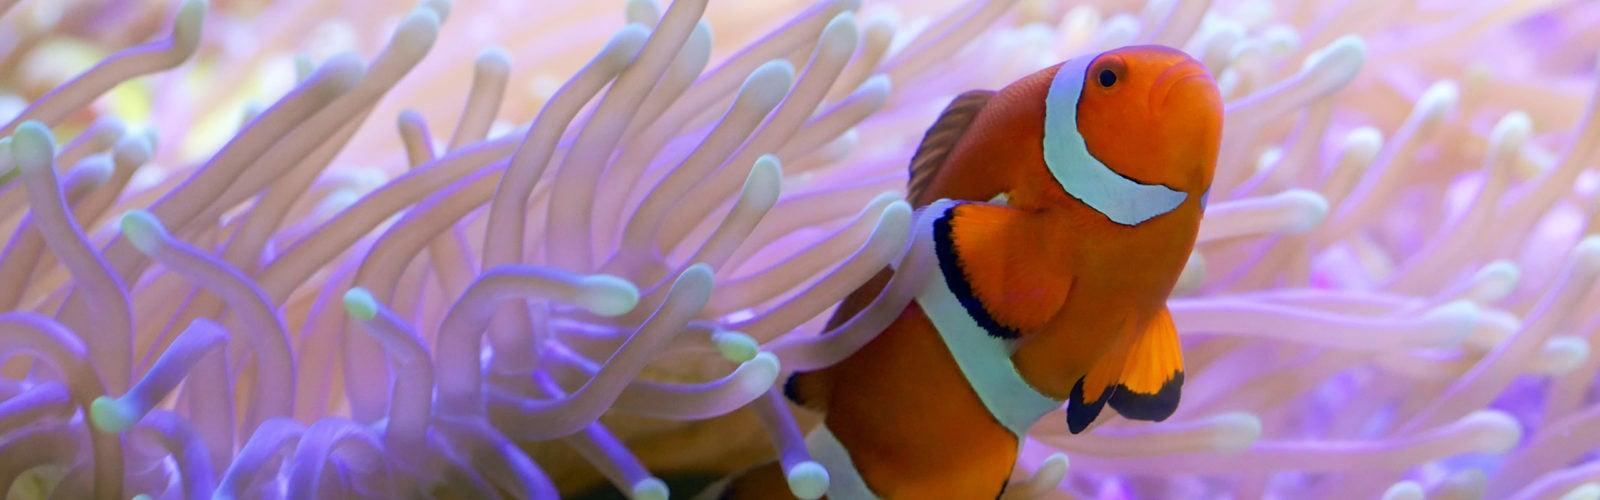 great-barrier-reef-clown-fish